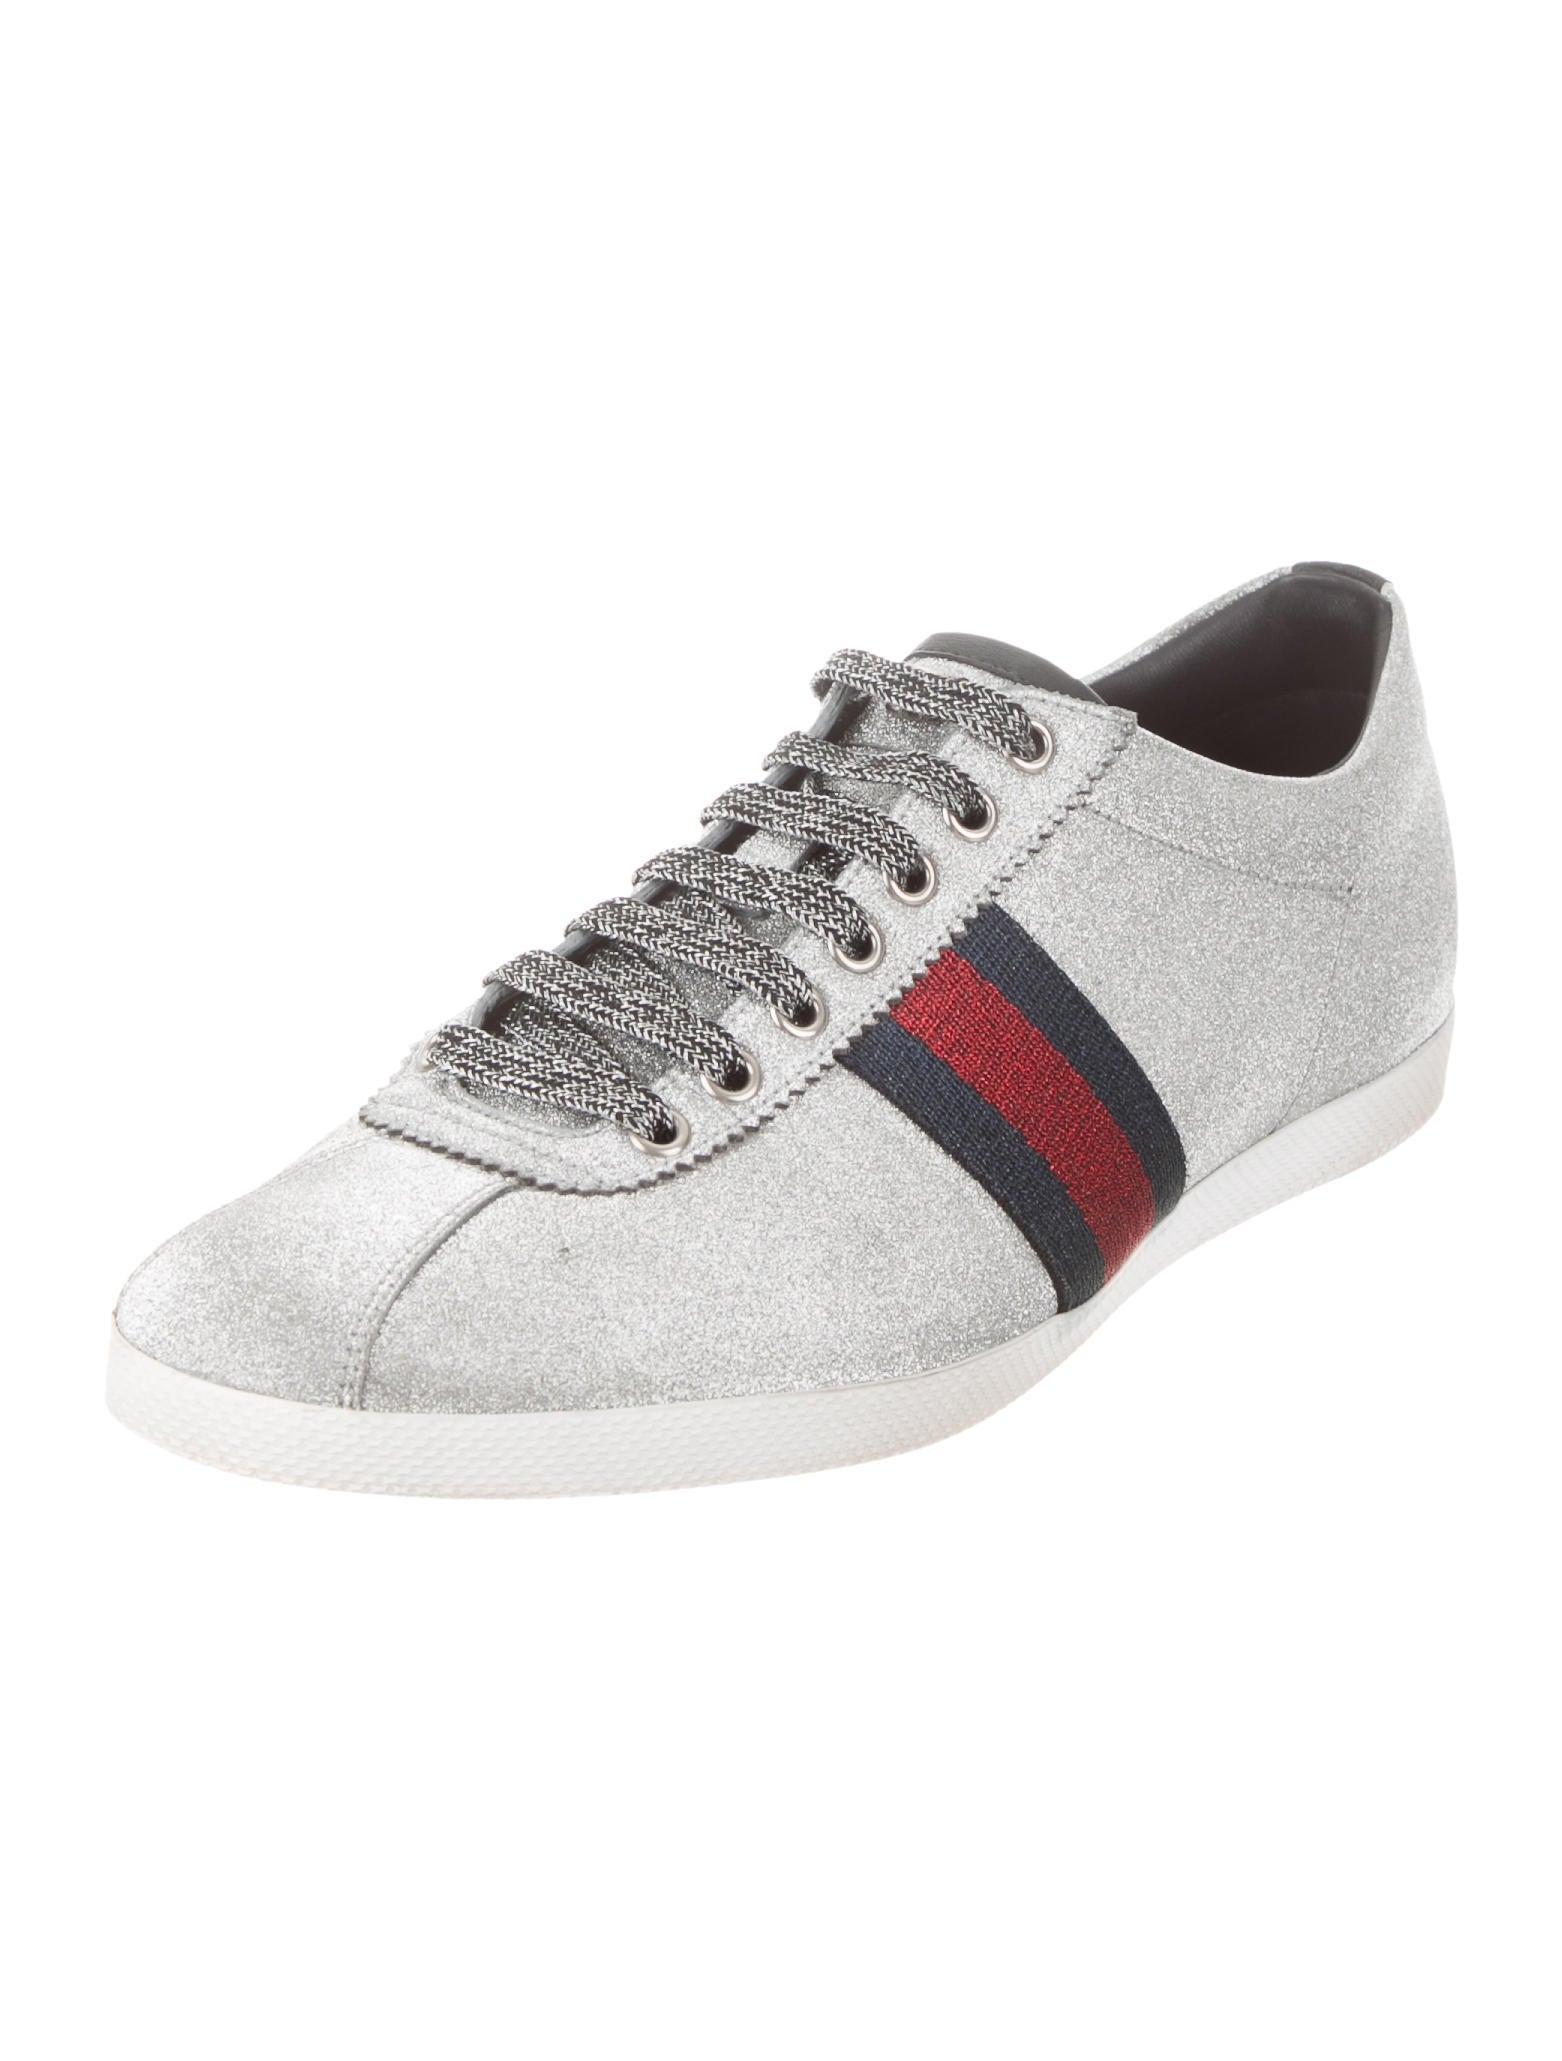 Gucci Bambi Metallic Trainer Sneakers